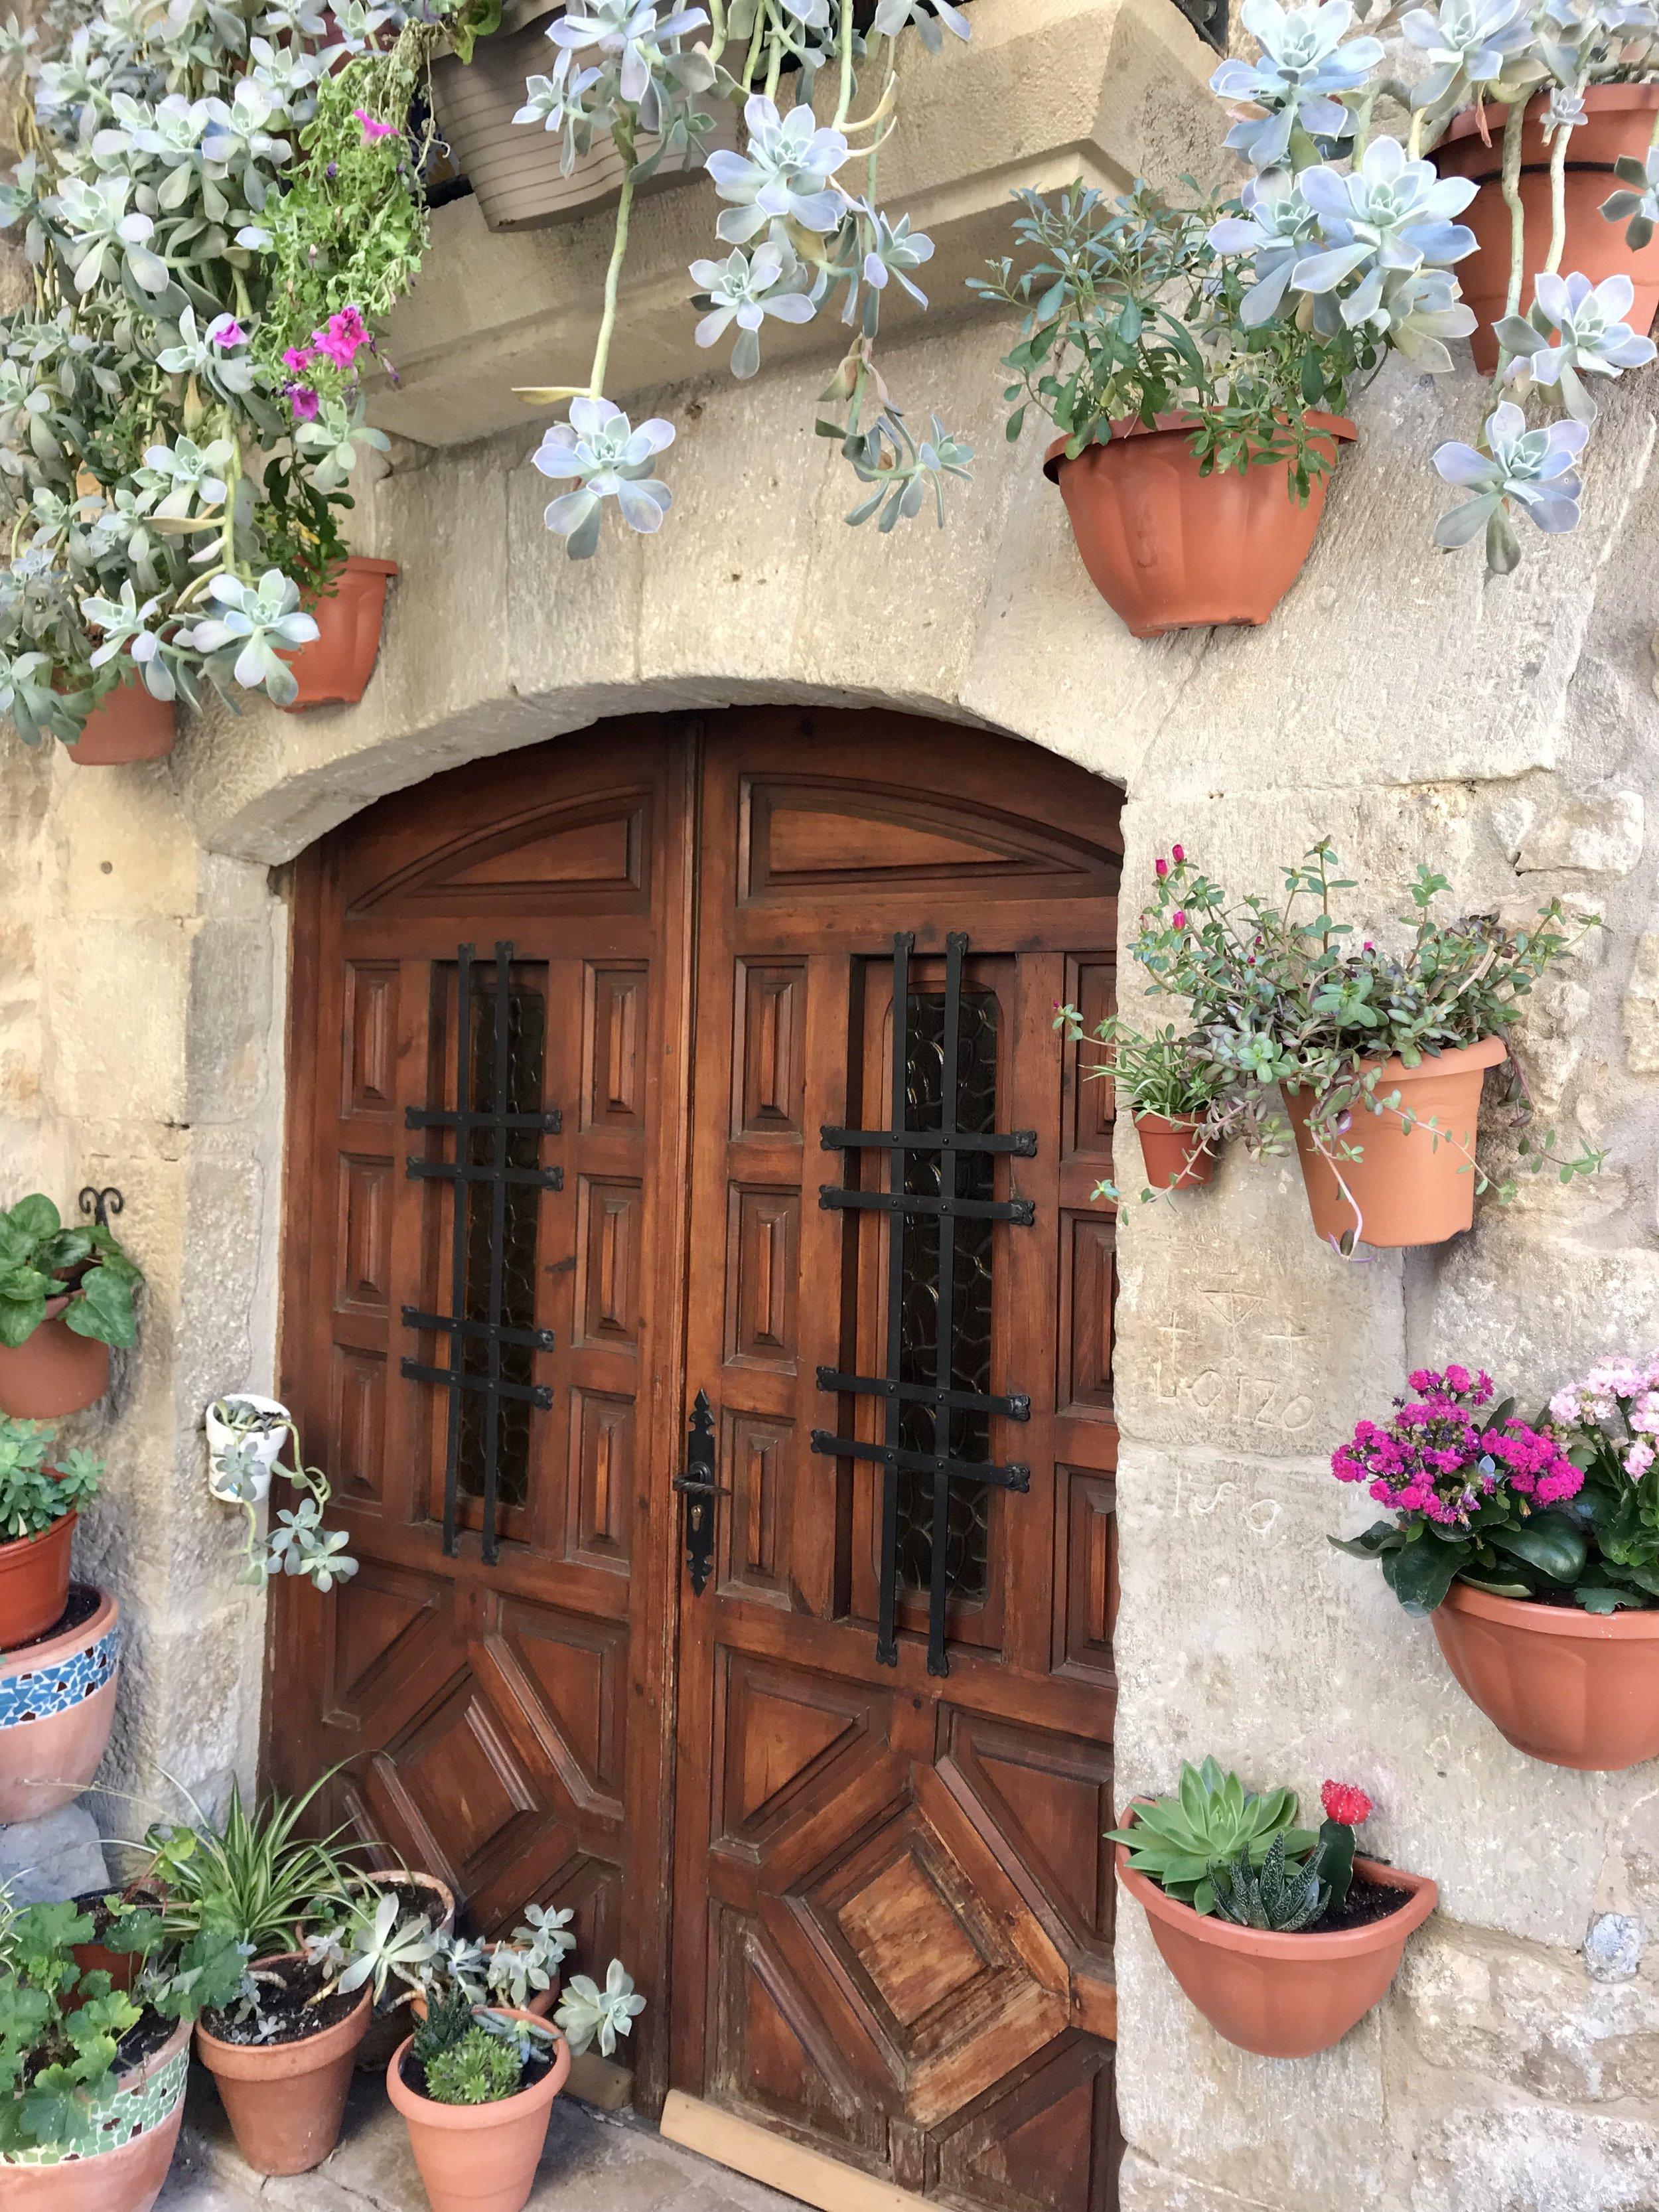 Charming entryway